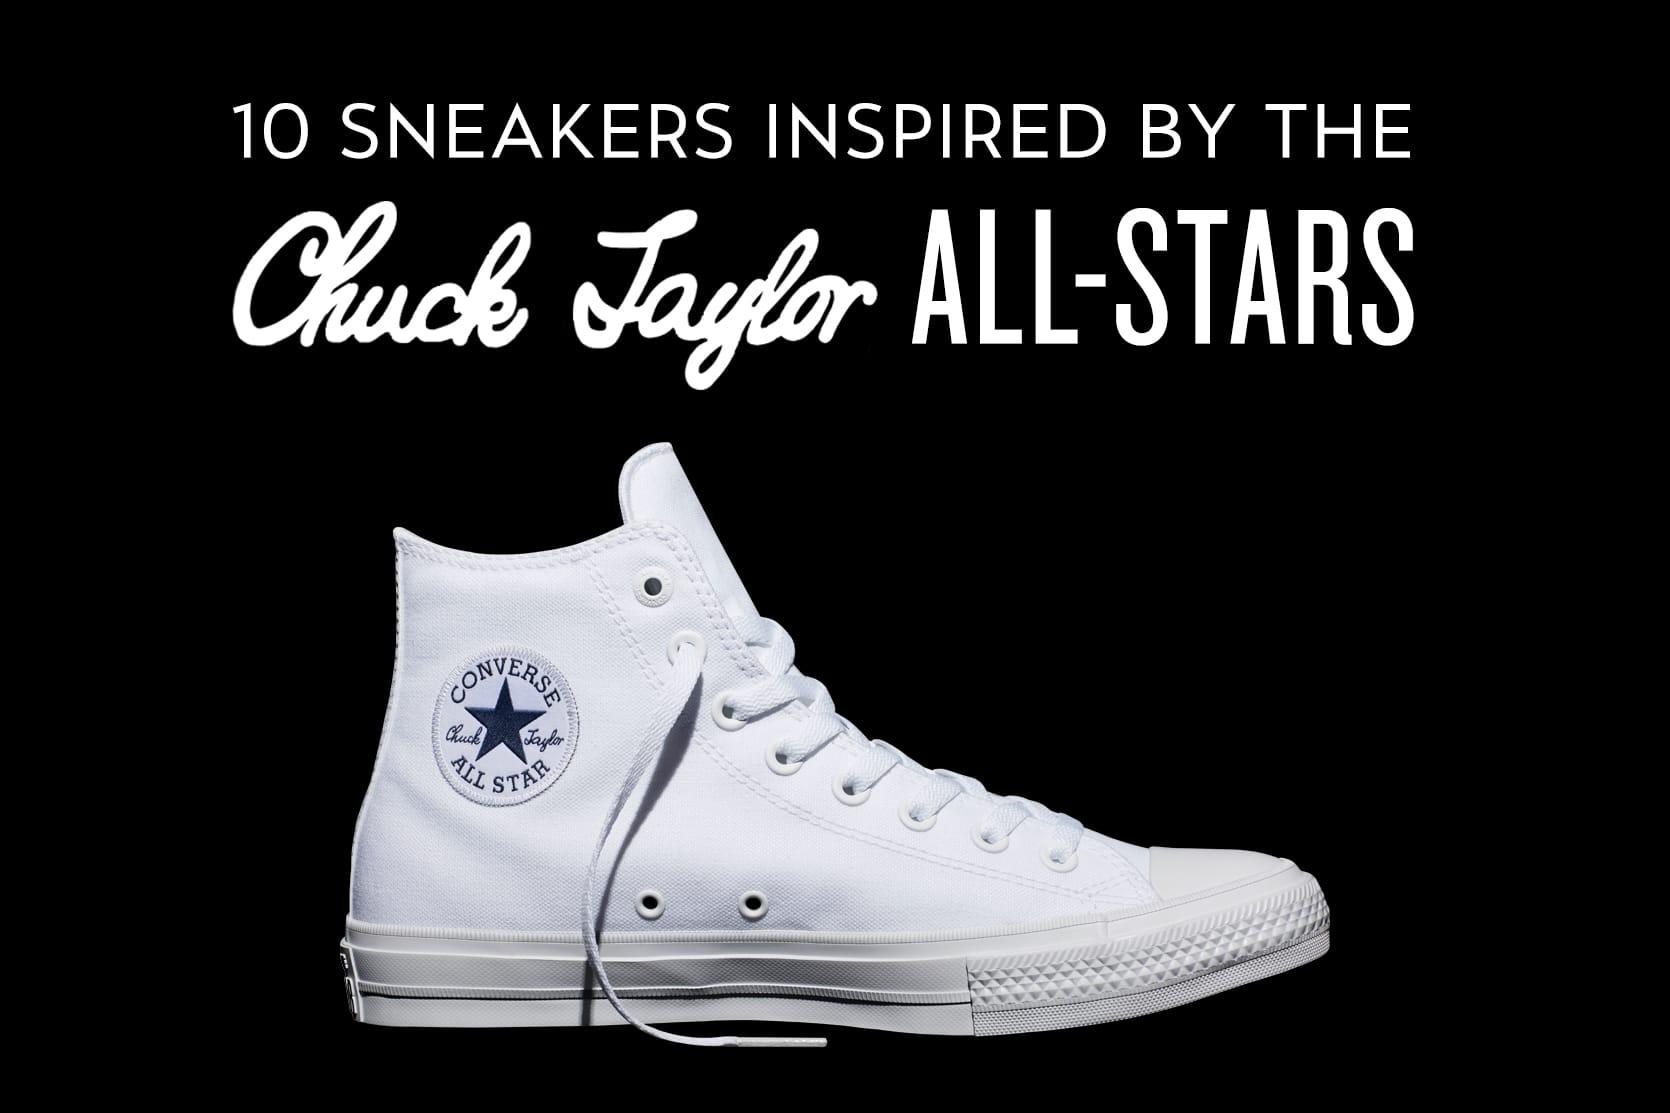 Converse Chuck Taylor All-Stars